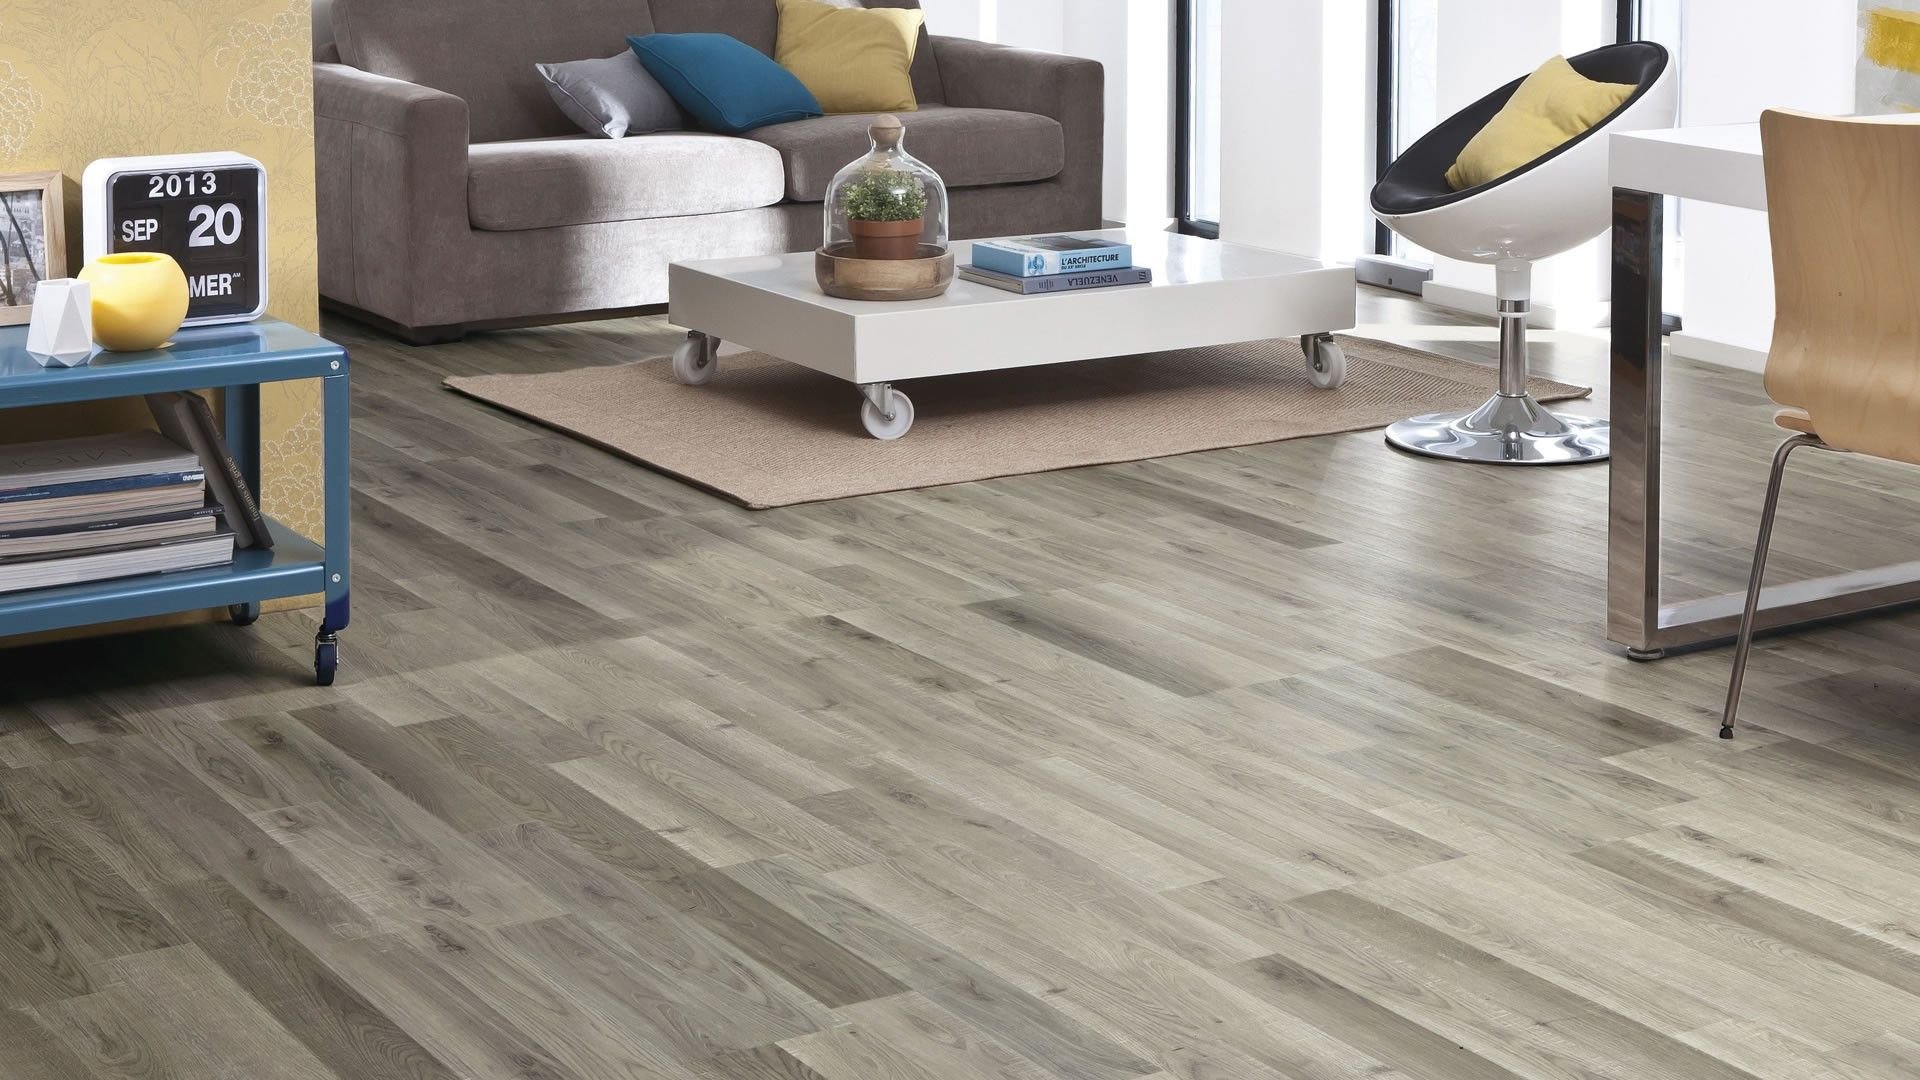 sol stratifi easywood bohemian oak saint maclou. Black Bedroom Furniture Sets. Home Design Ideas